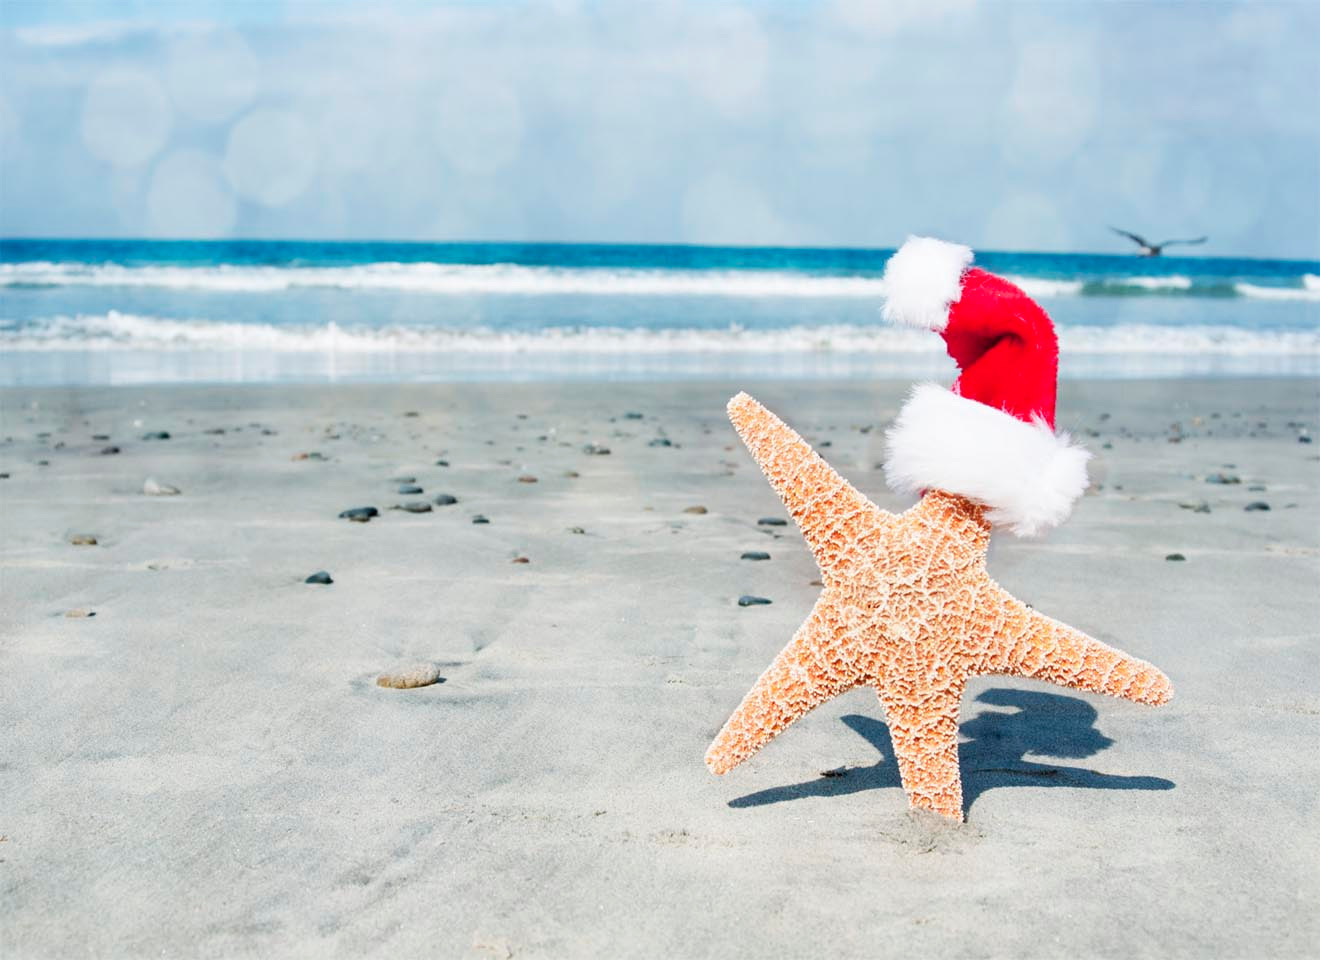 Christmas at the Beach Wallpaper - WallpaperSafari